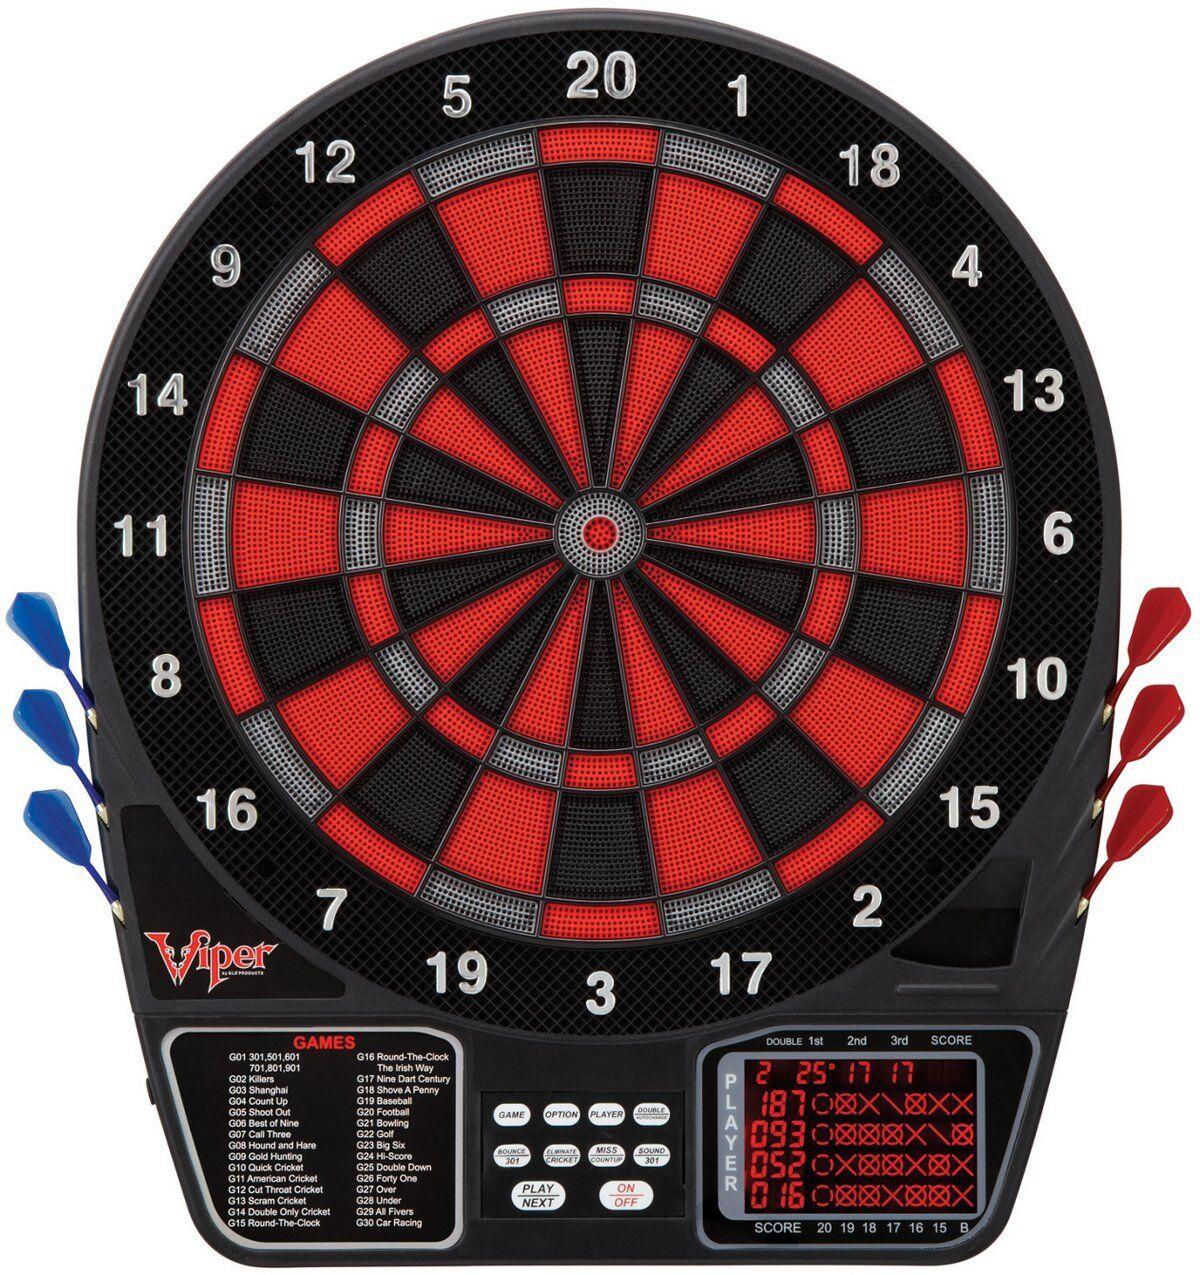 Viper 797 Electronic Soft Tip Dartboard.  Item 42-1017 NEW, Open Box